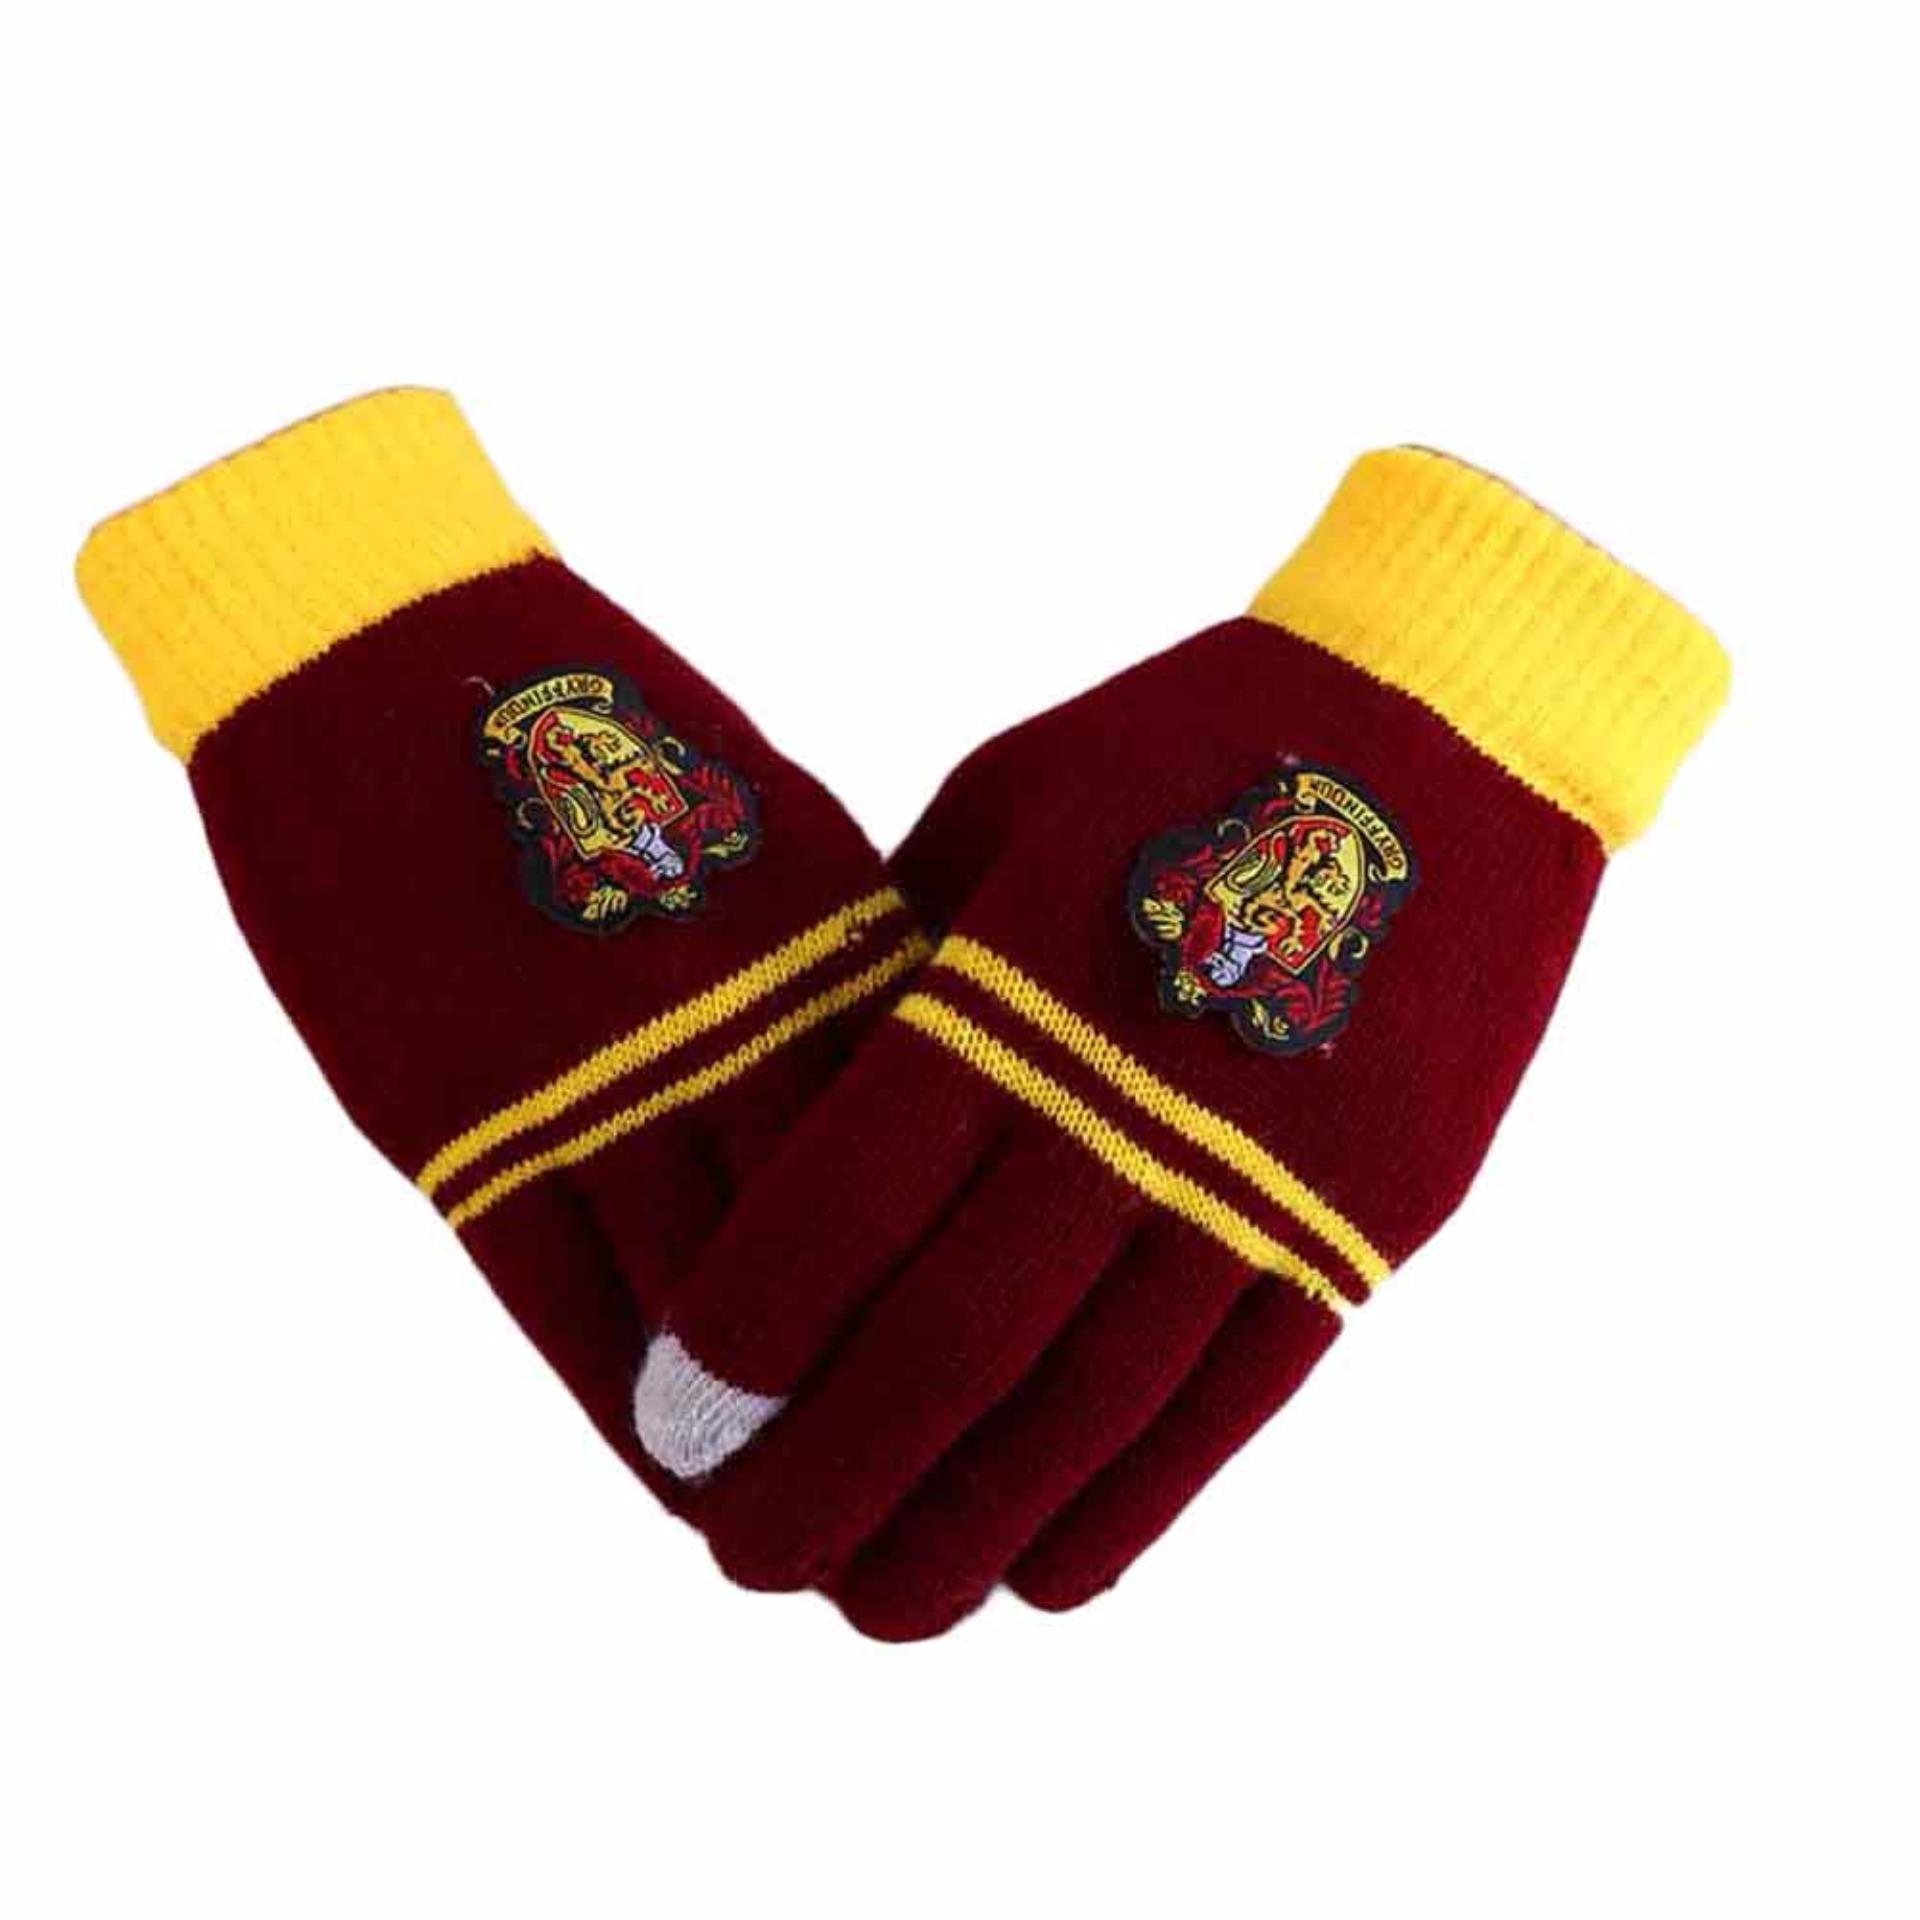 Jual Beli Online Fancyqube Harry Potter Karena Merajut Layar Sentuh Magic Sarung Tangan Gryffindor Lencana Sekolah Keempat Sarung Tangan Internasional